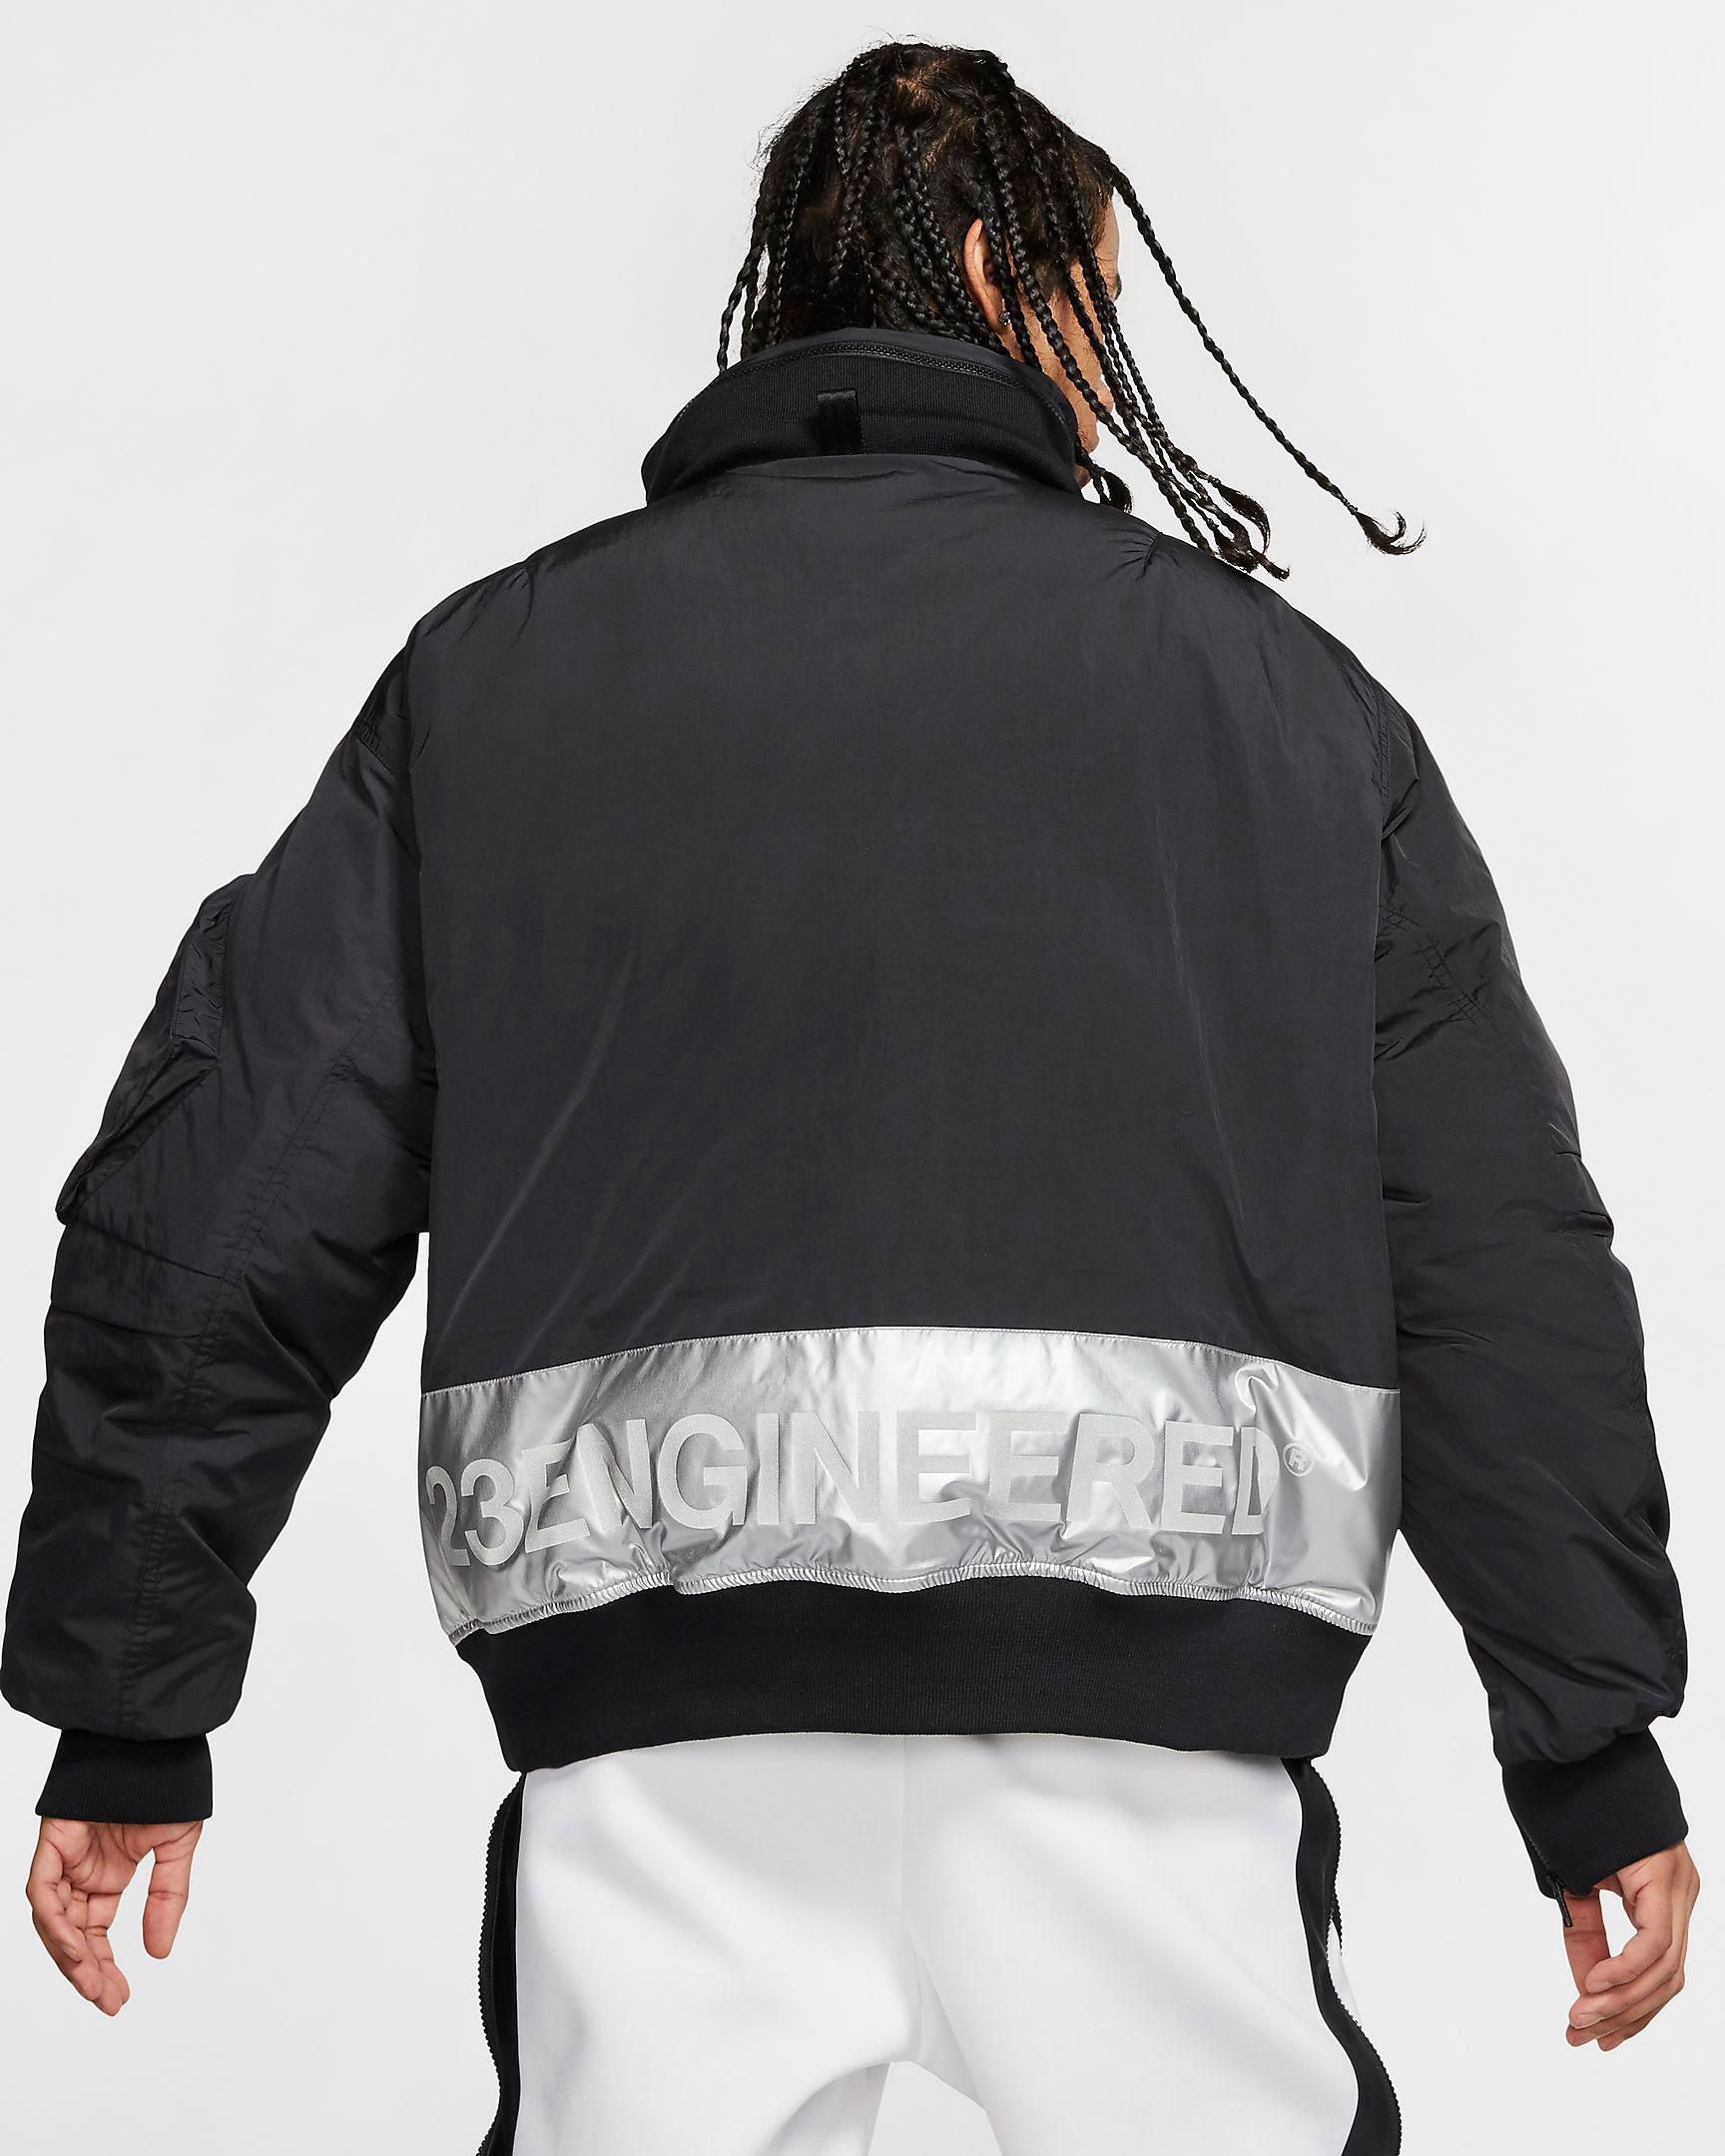 jordan-23-engineered-ma1-down-jacket-black-silver-2